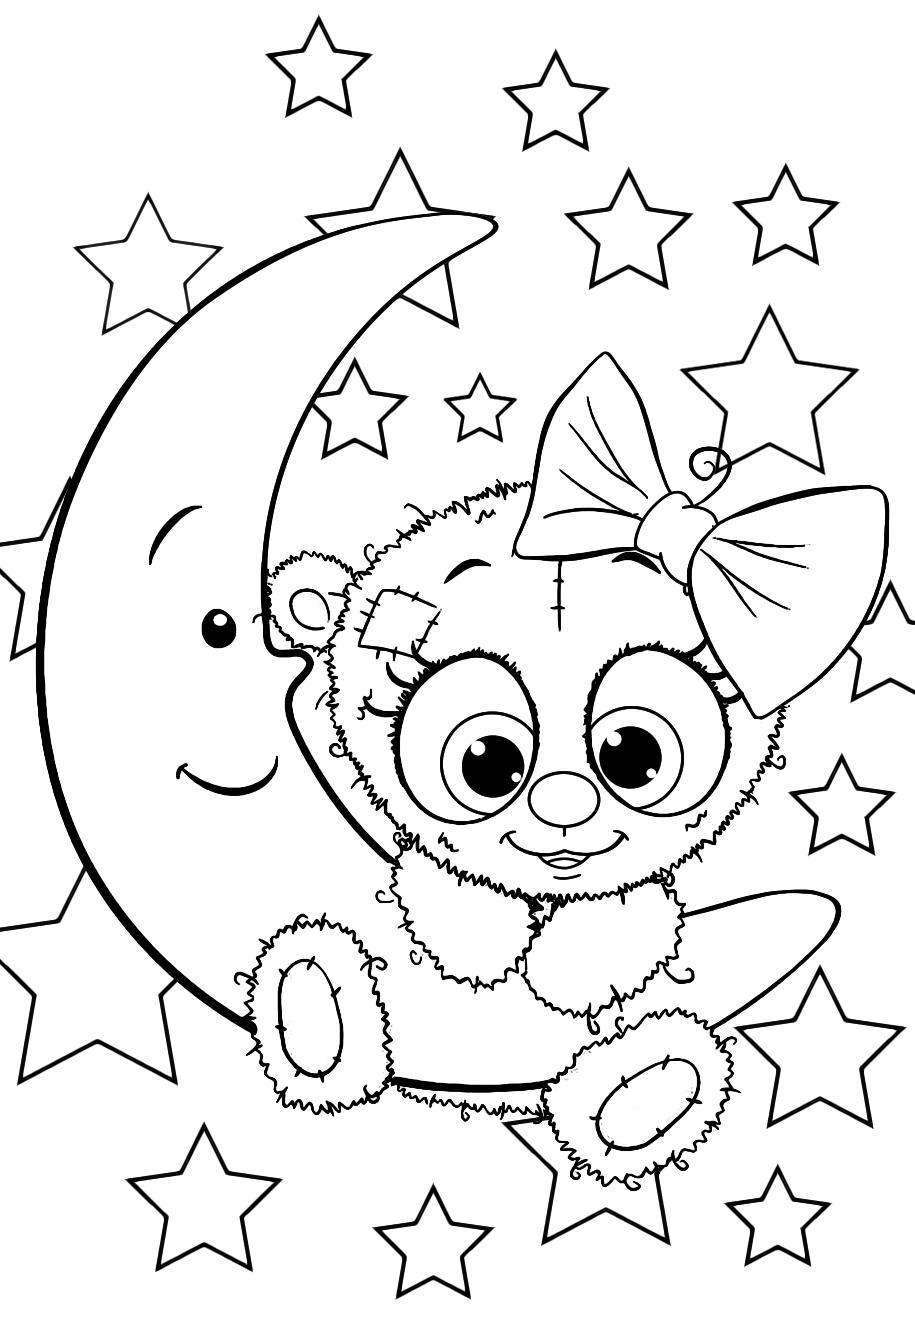 Девочка мишка Тедди - Милашки - Раскраски антистресс